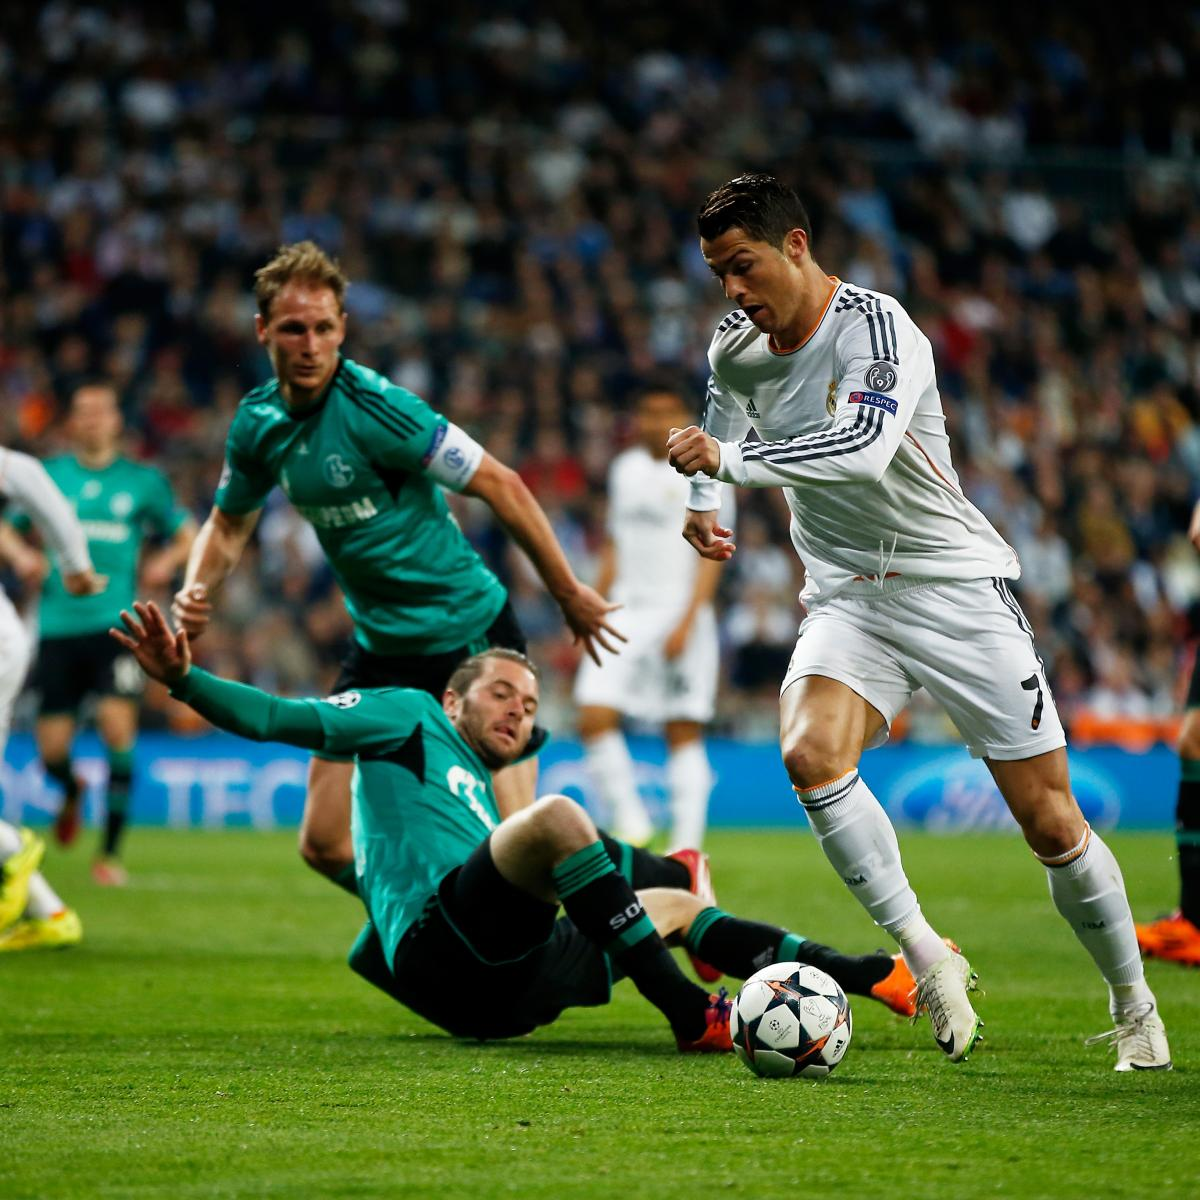 Champions League 2019 Round Of 16 Leg 2 Live Stream Tv: Schalke Vs. Real Madrid: Team News, Predicted Line-Ups